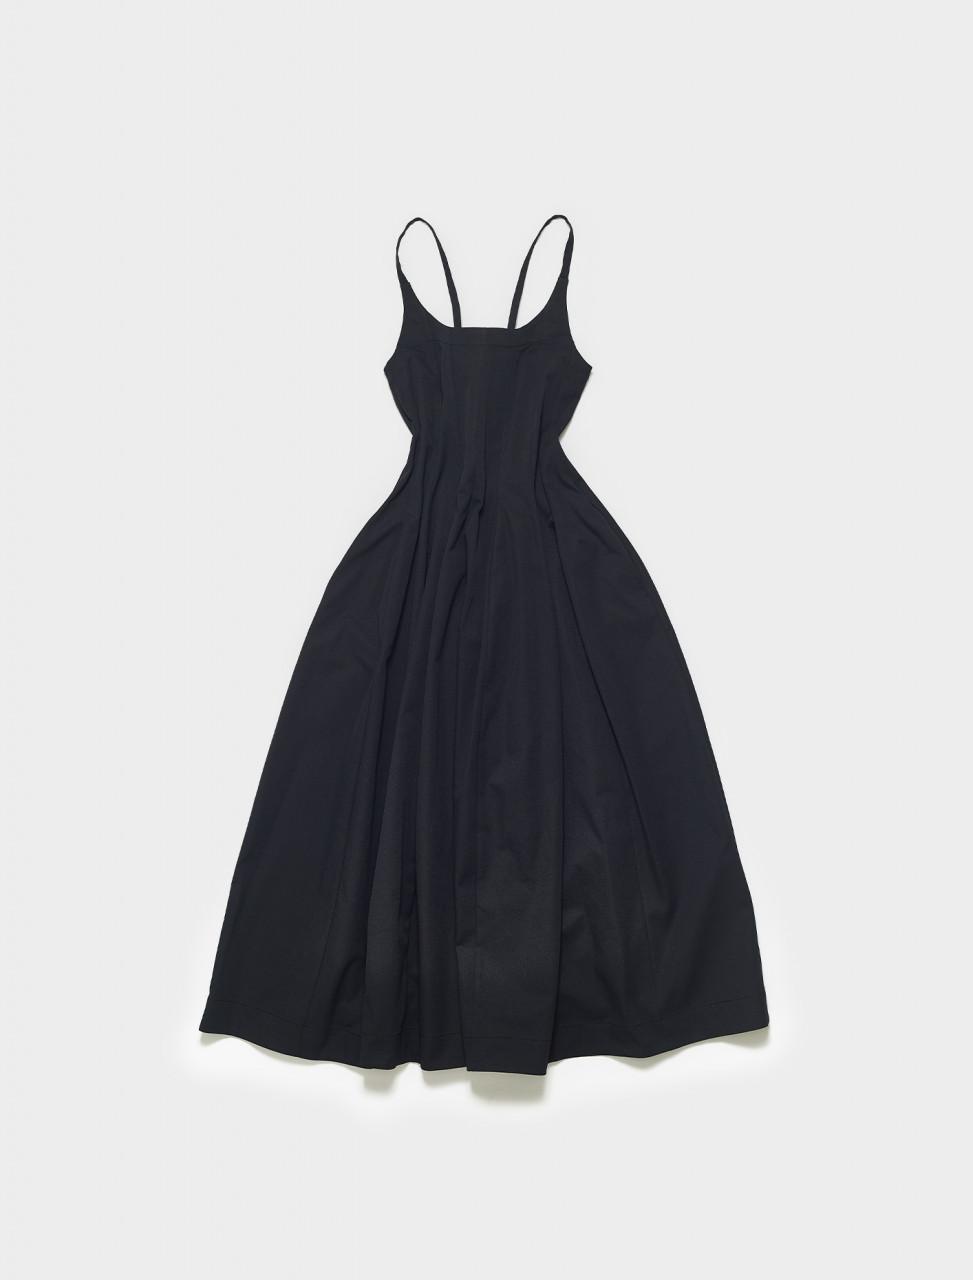 JSPS710060-WS457408-001 JIL SANDER SLEEVELESS DRESS BLACK